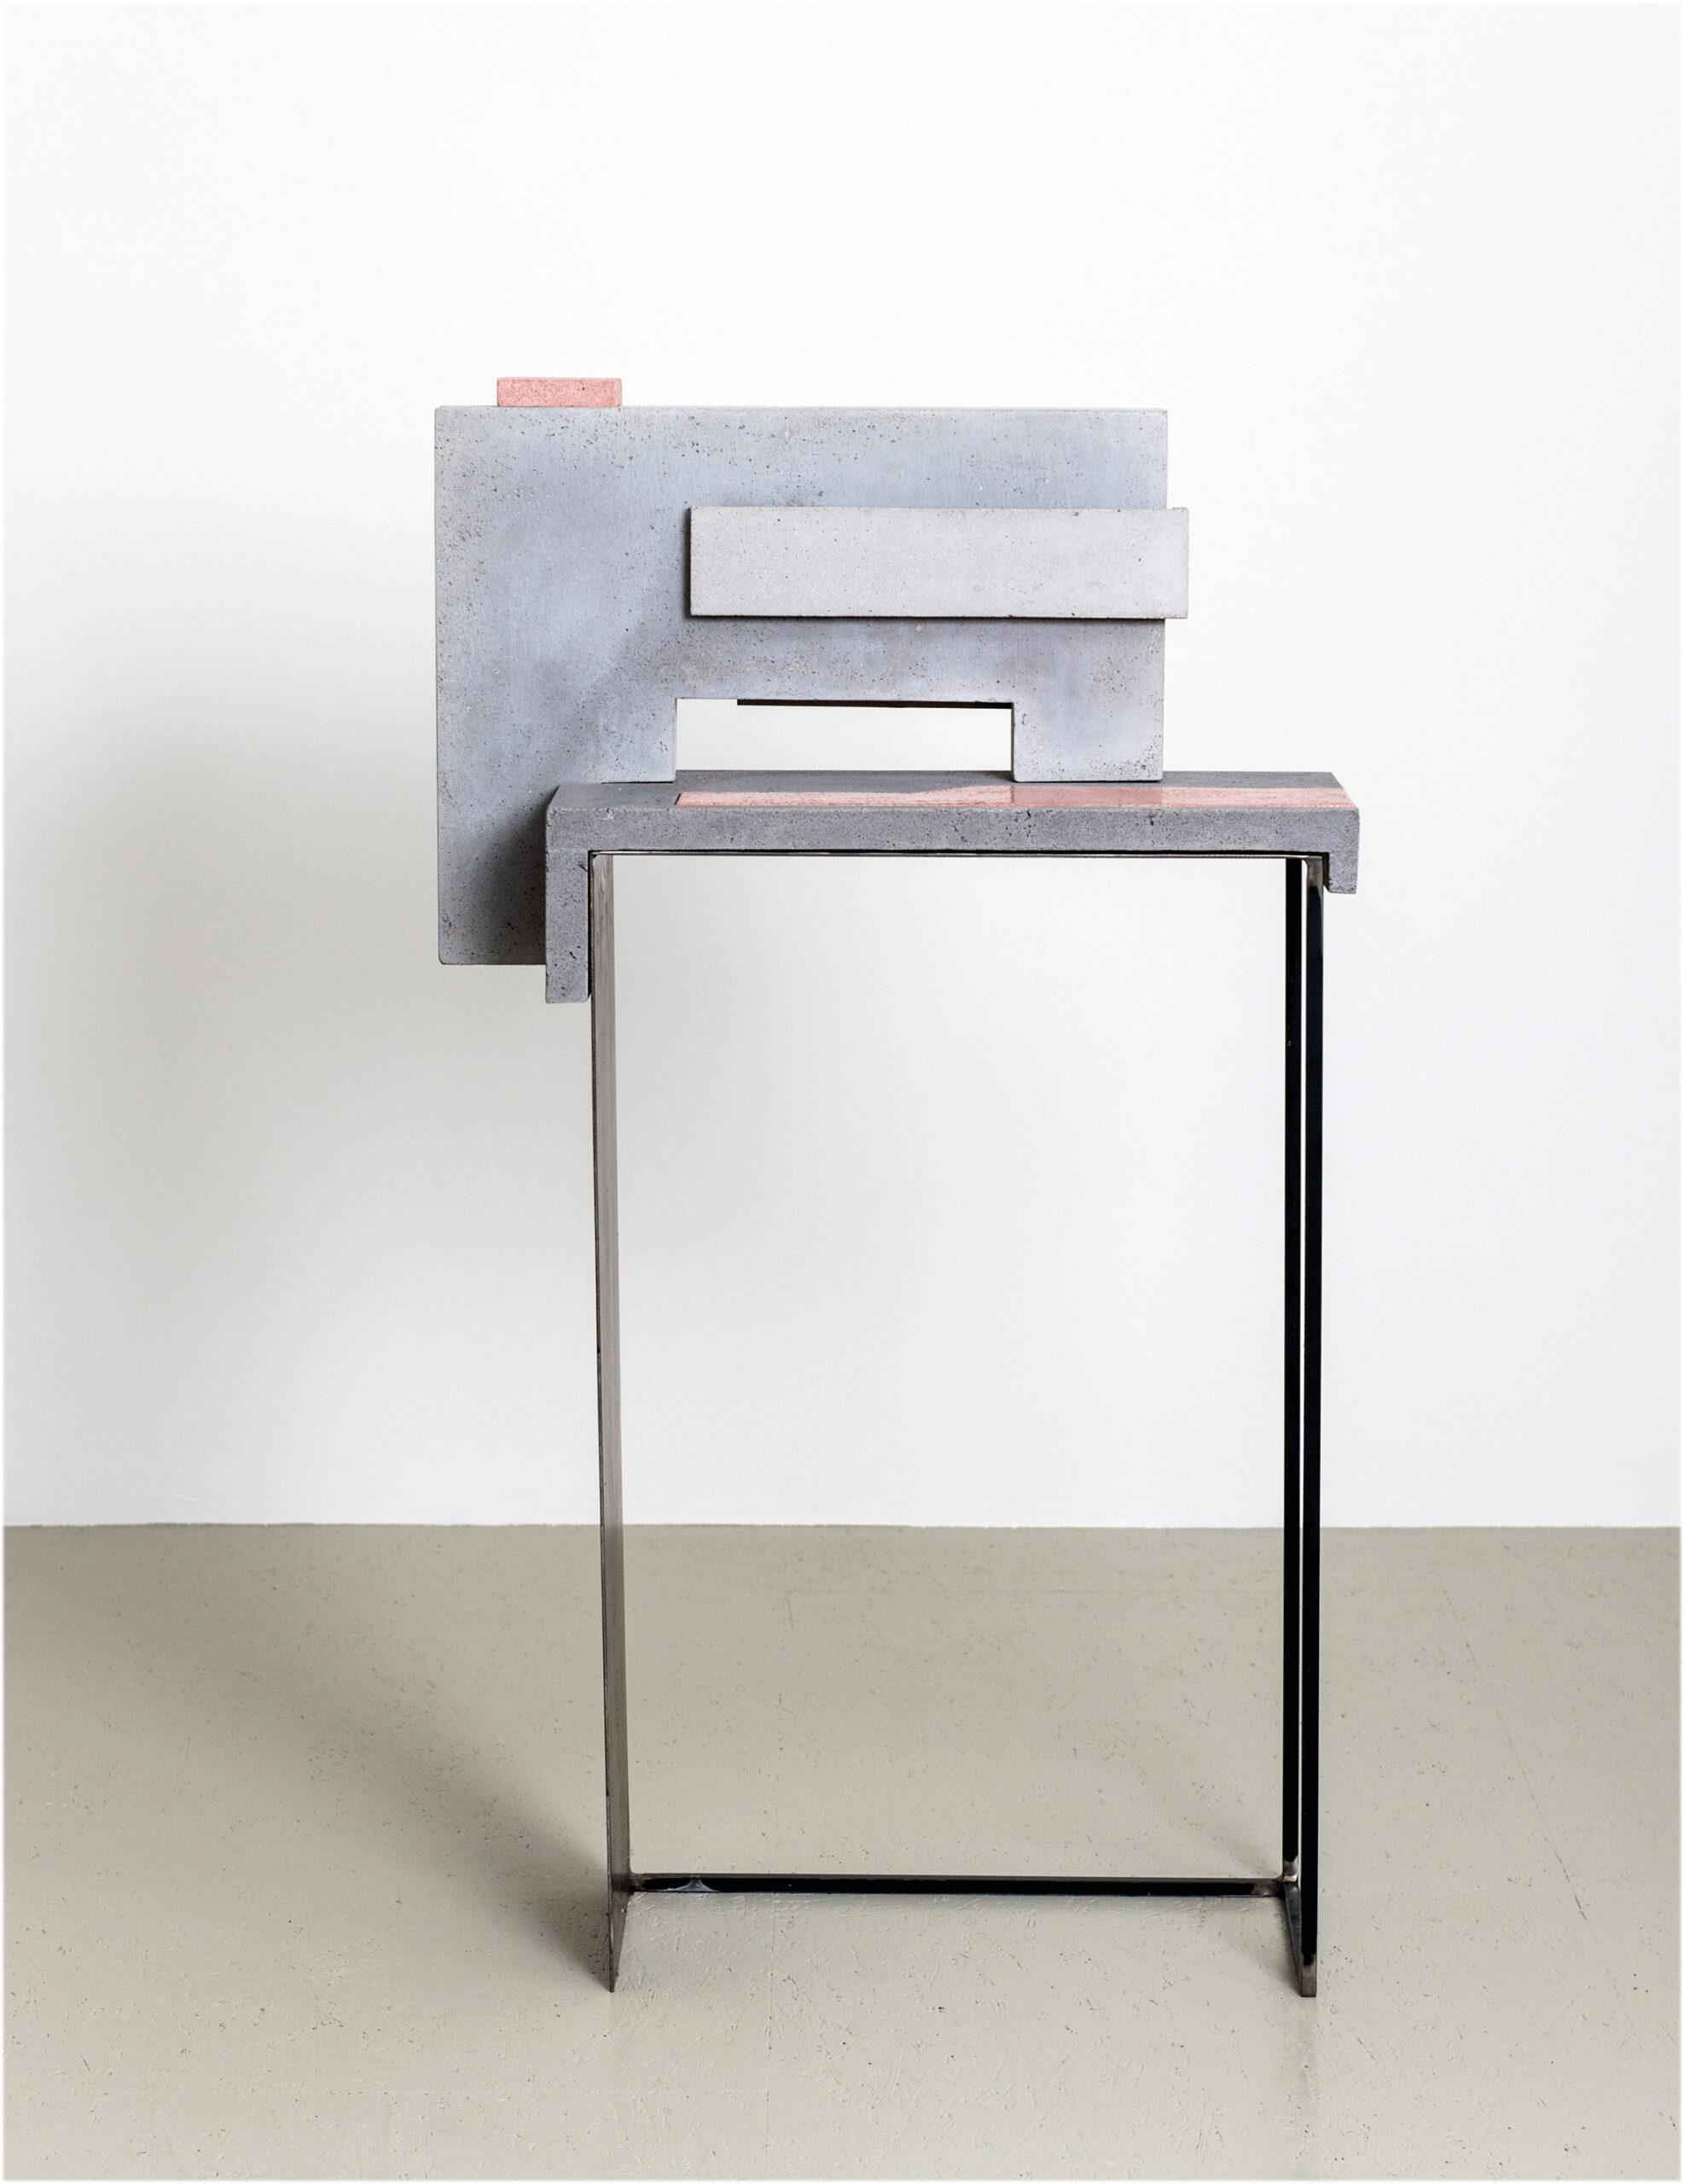 Espace|Surface 2 | 2016 | Steinzeug,Beton | 66 x 24 x 119 cm